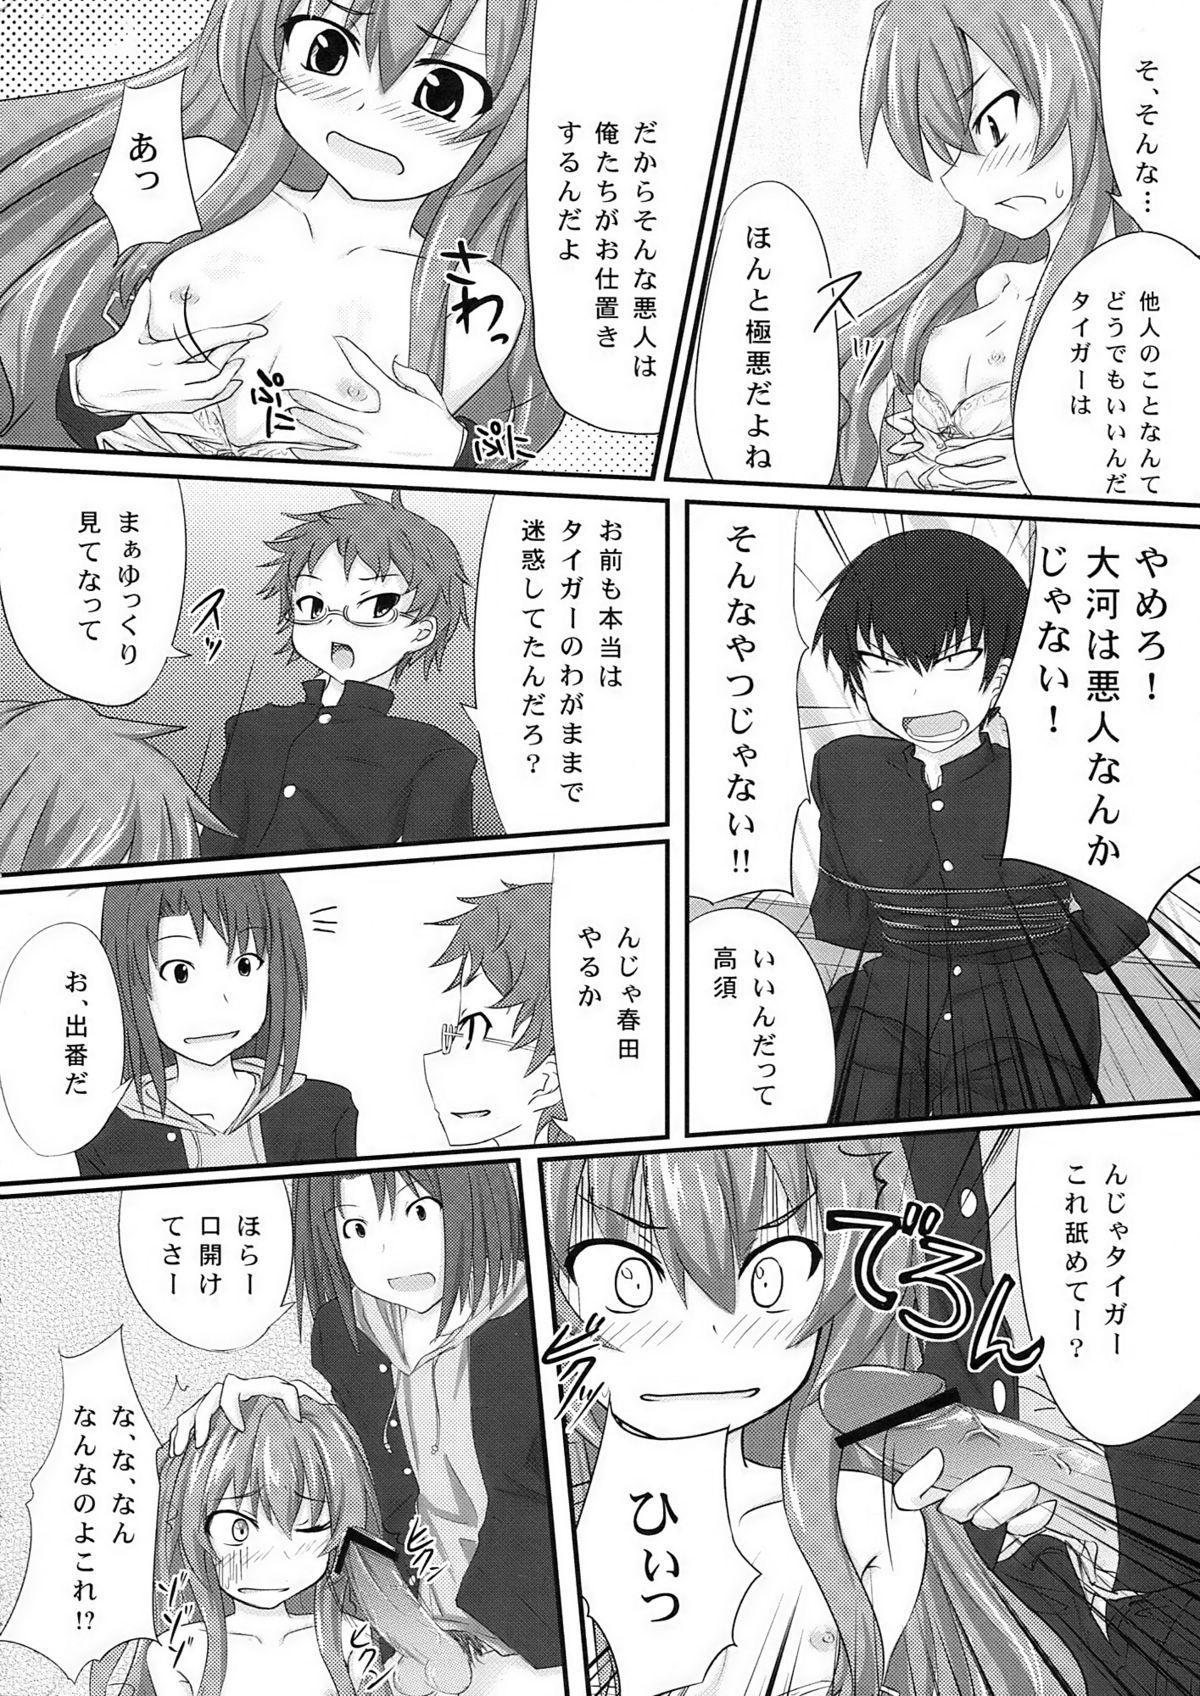 Shibarare Taiga! 9